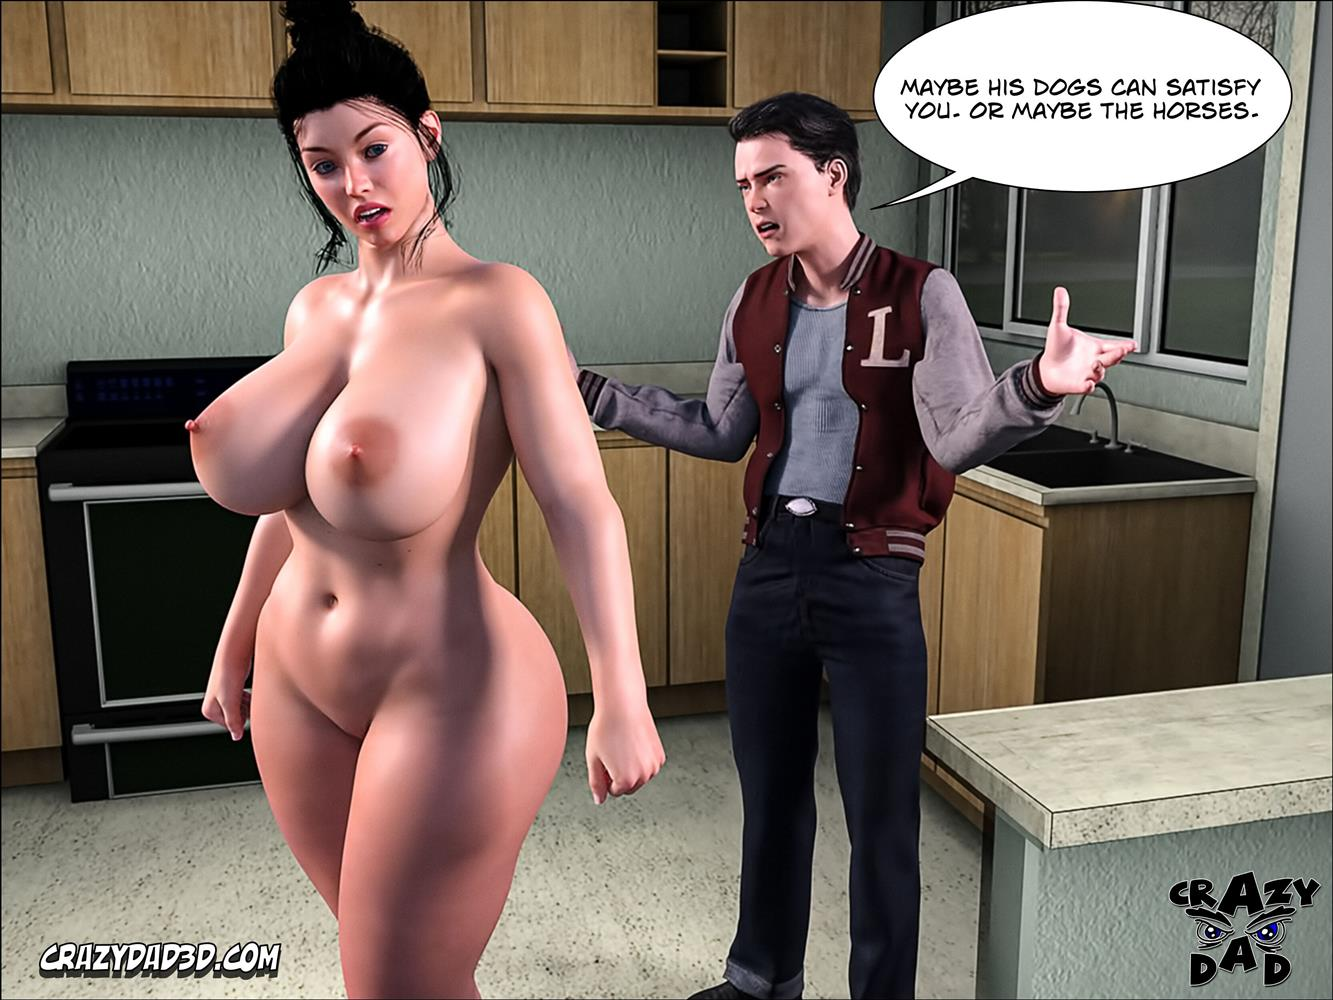 Mom's Help 15 [Crazy Dad 3D] - Foto 51